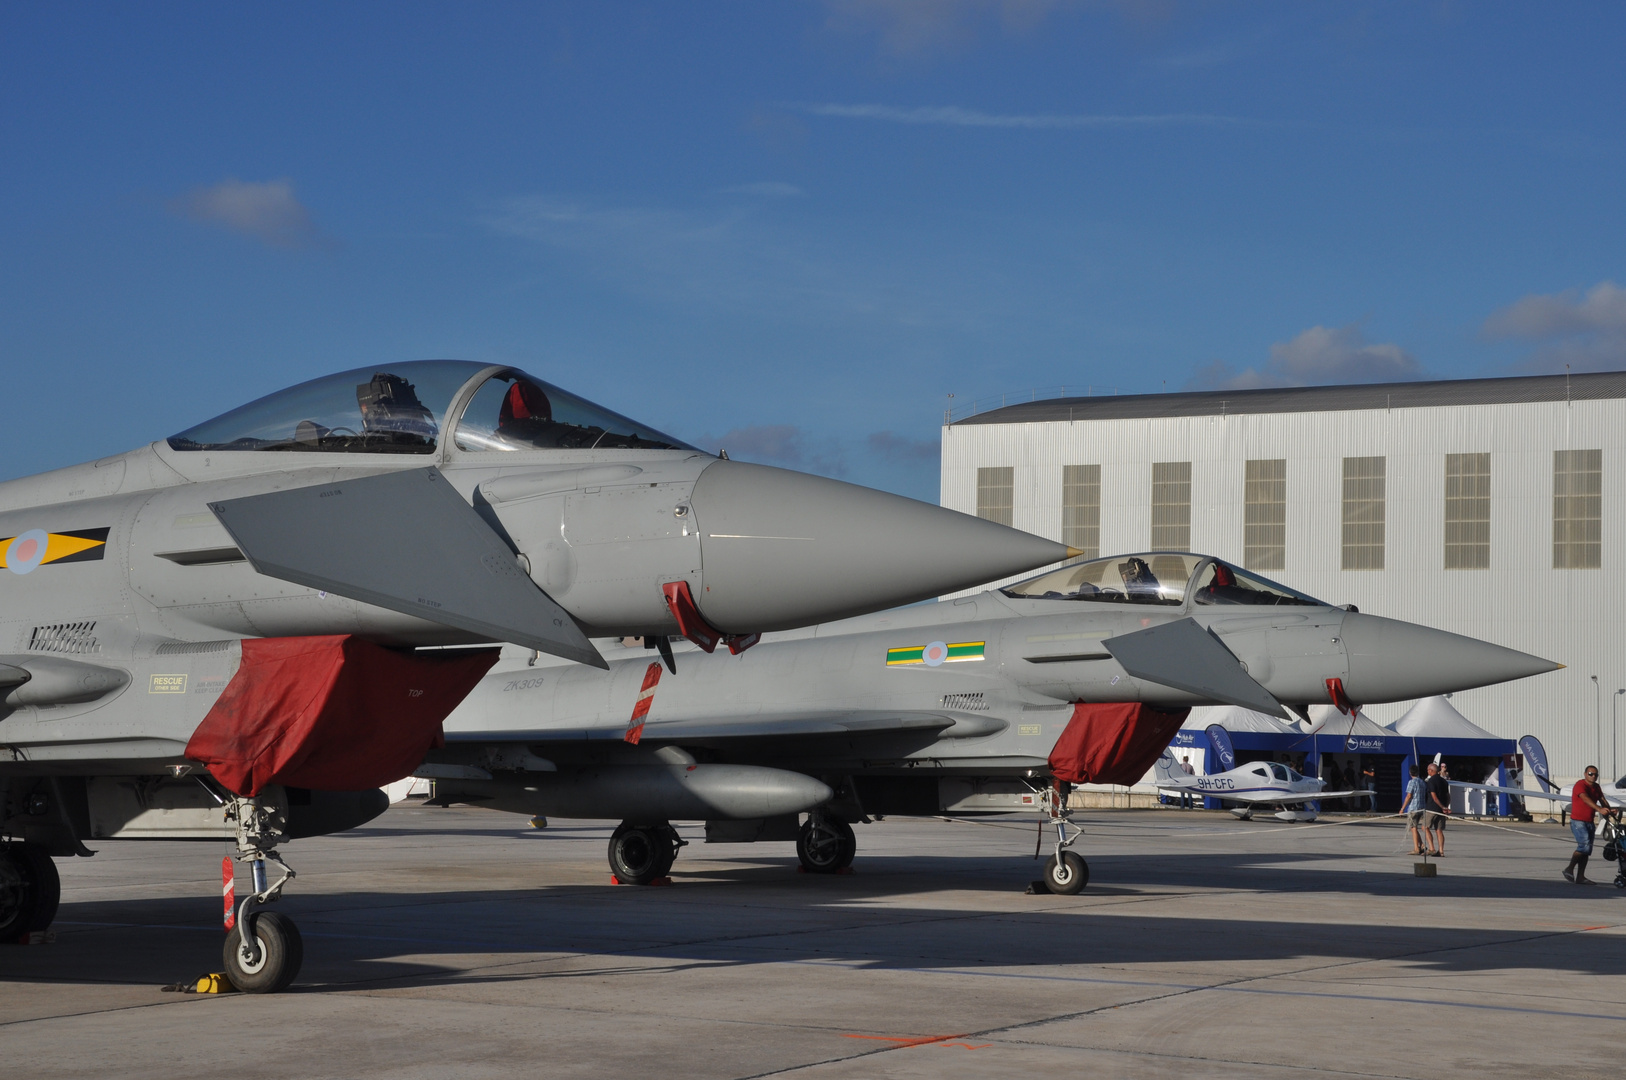 Malta International Airshow 2013 (02)